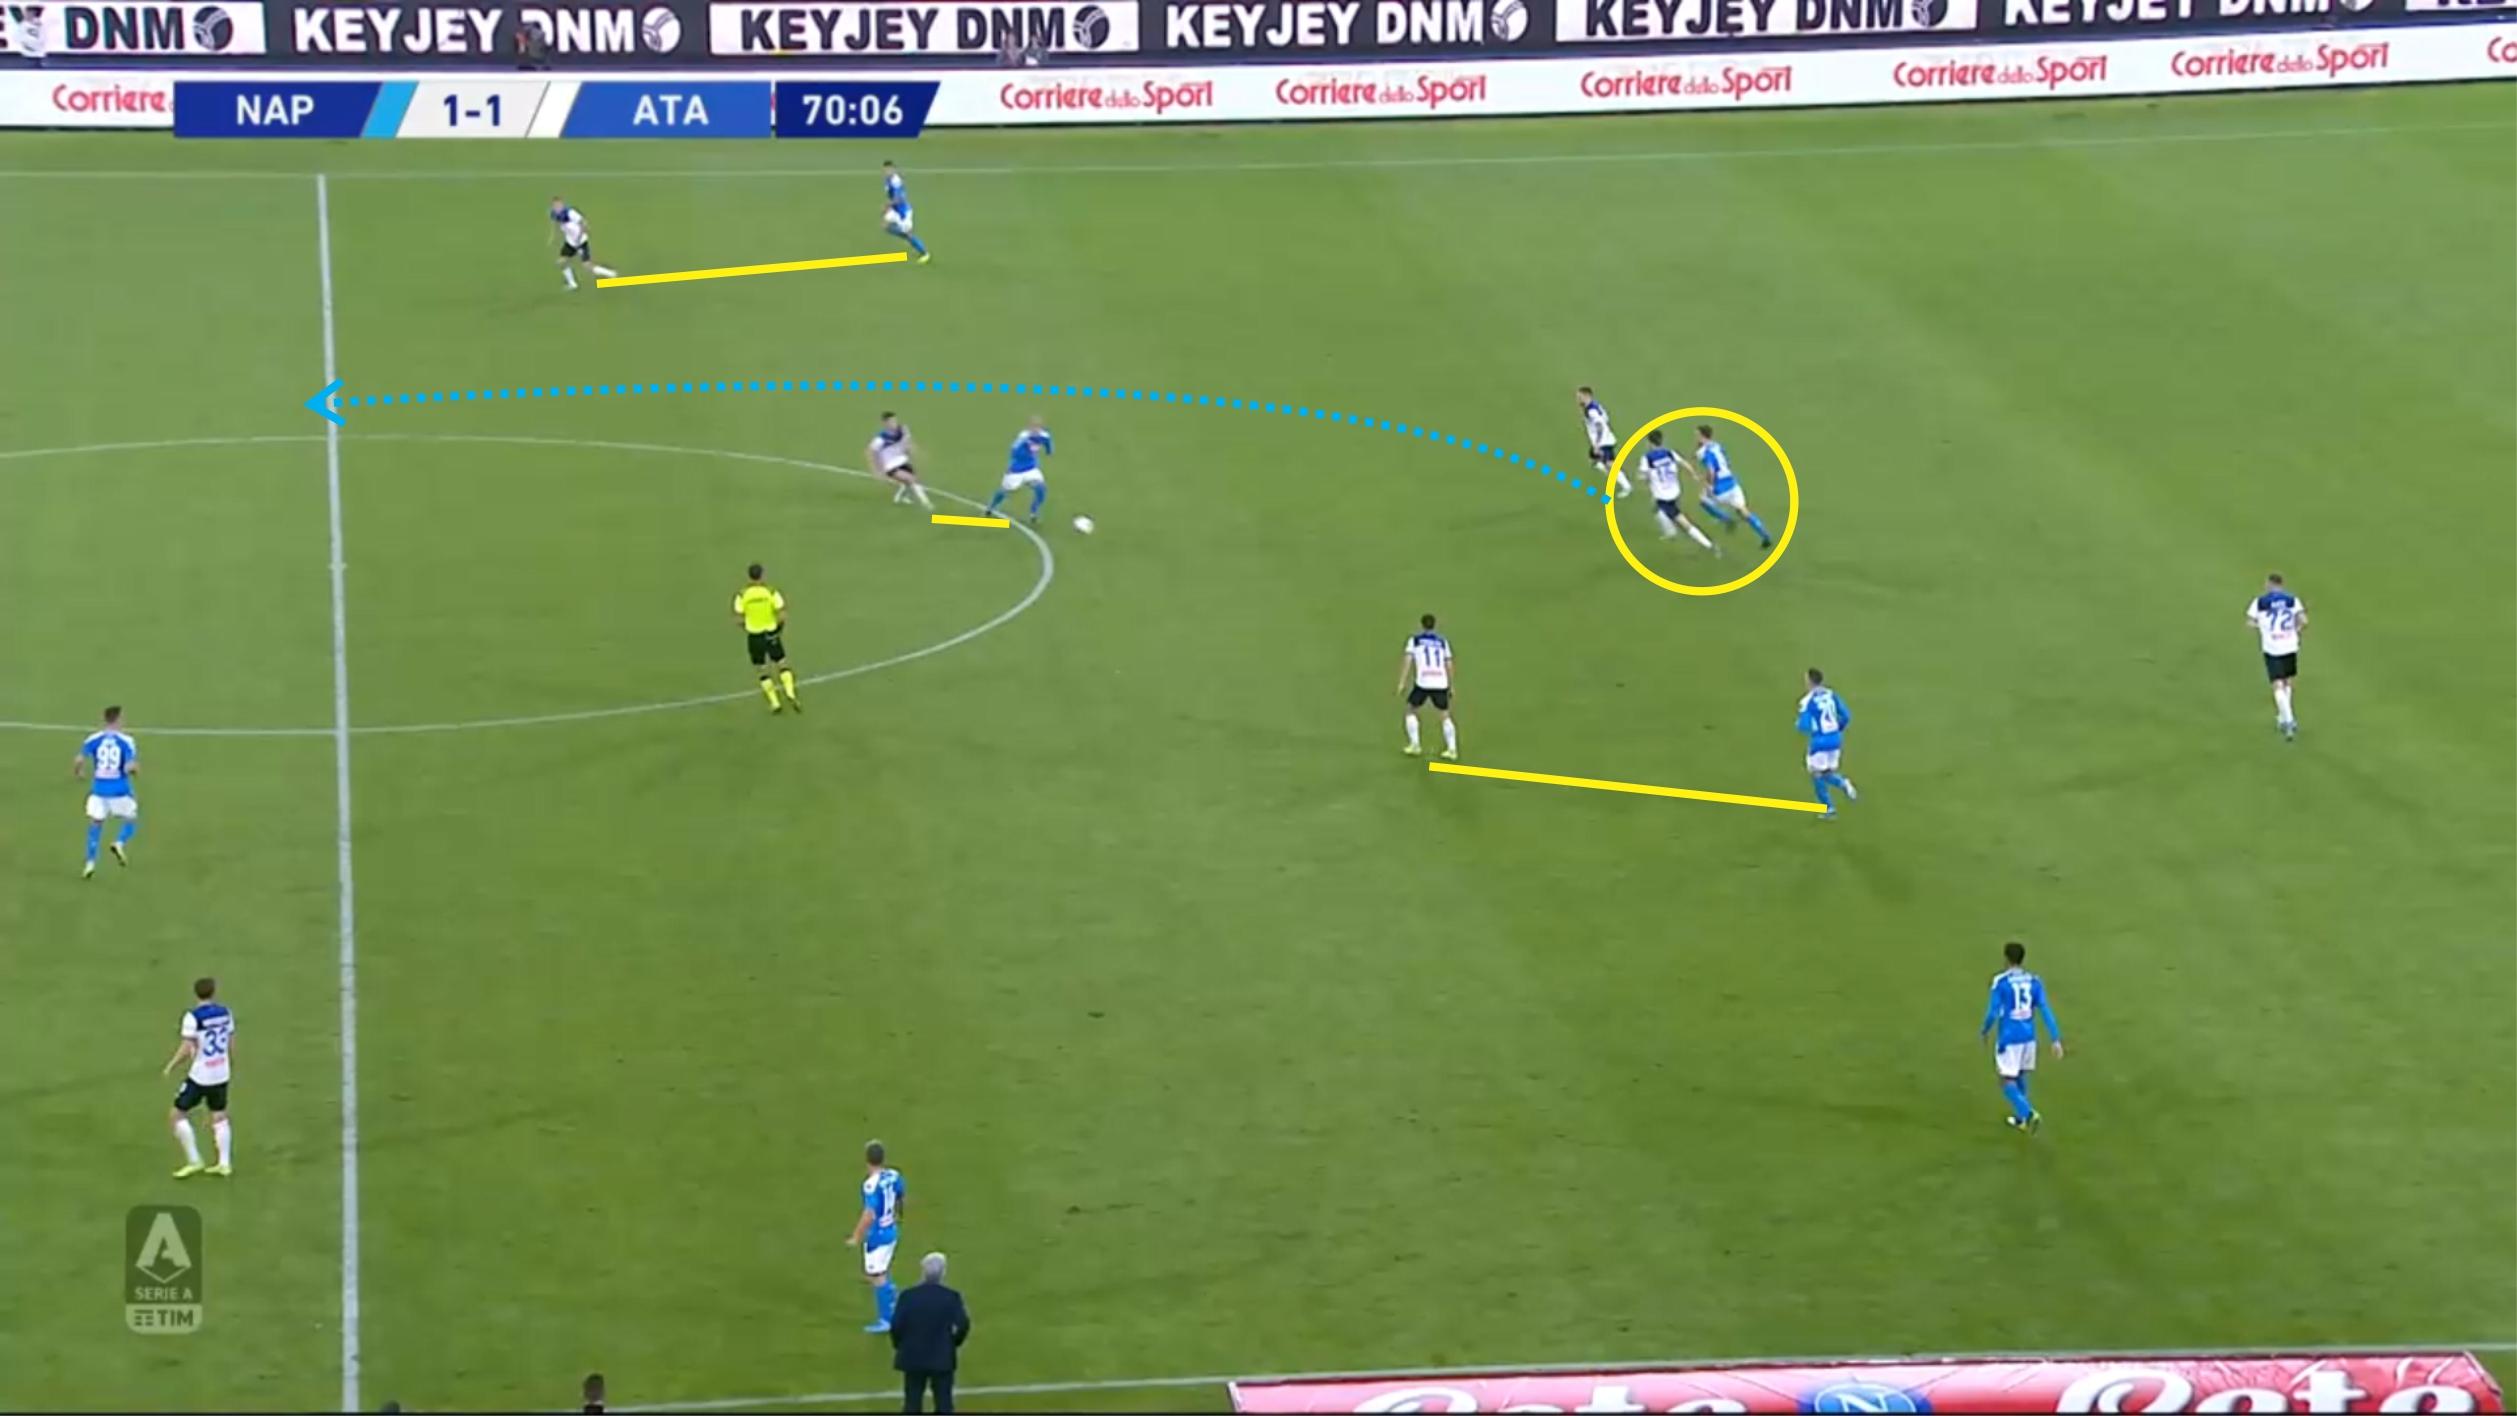 Serie A 2019/20: Napoli vs Atalanta - tactical analysis tactics